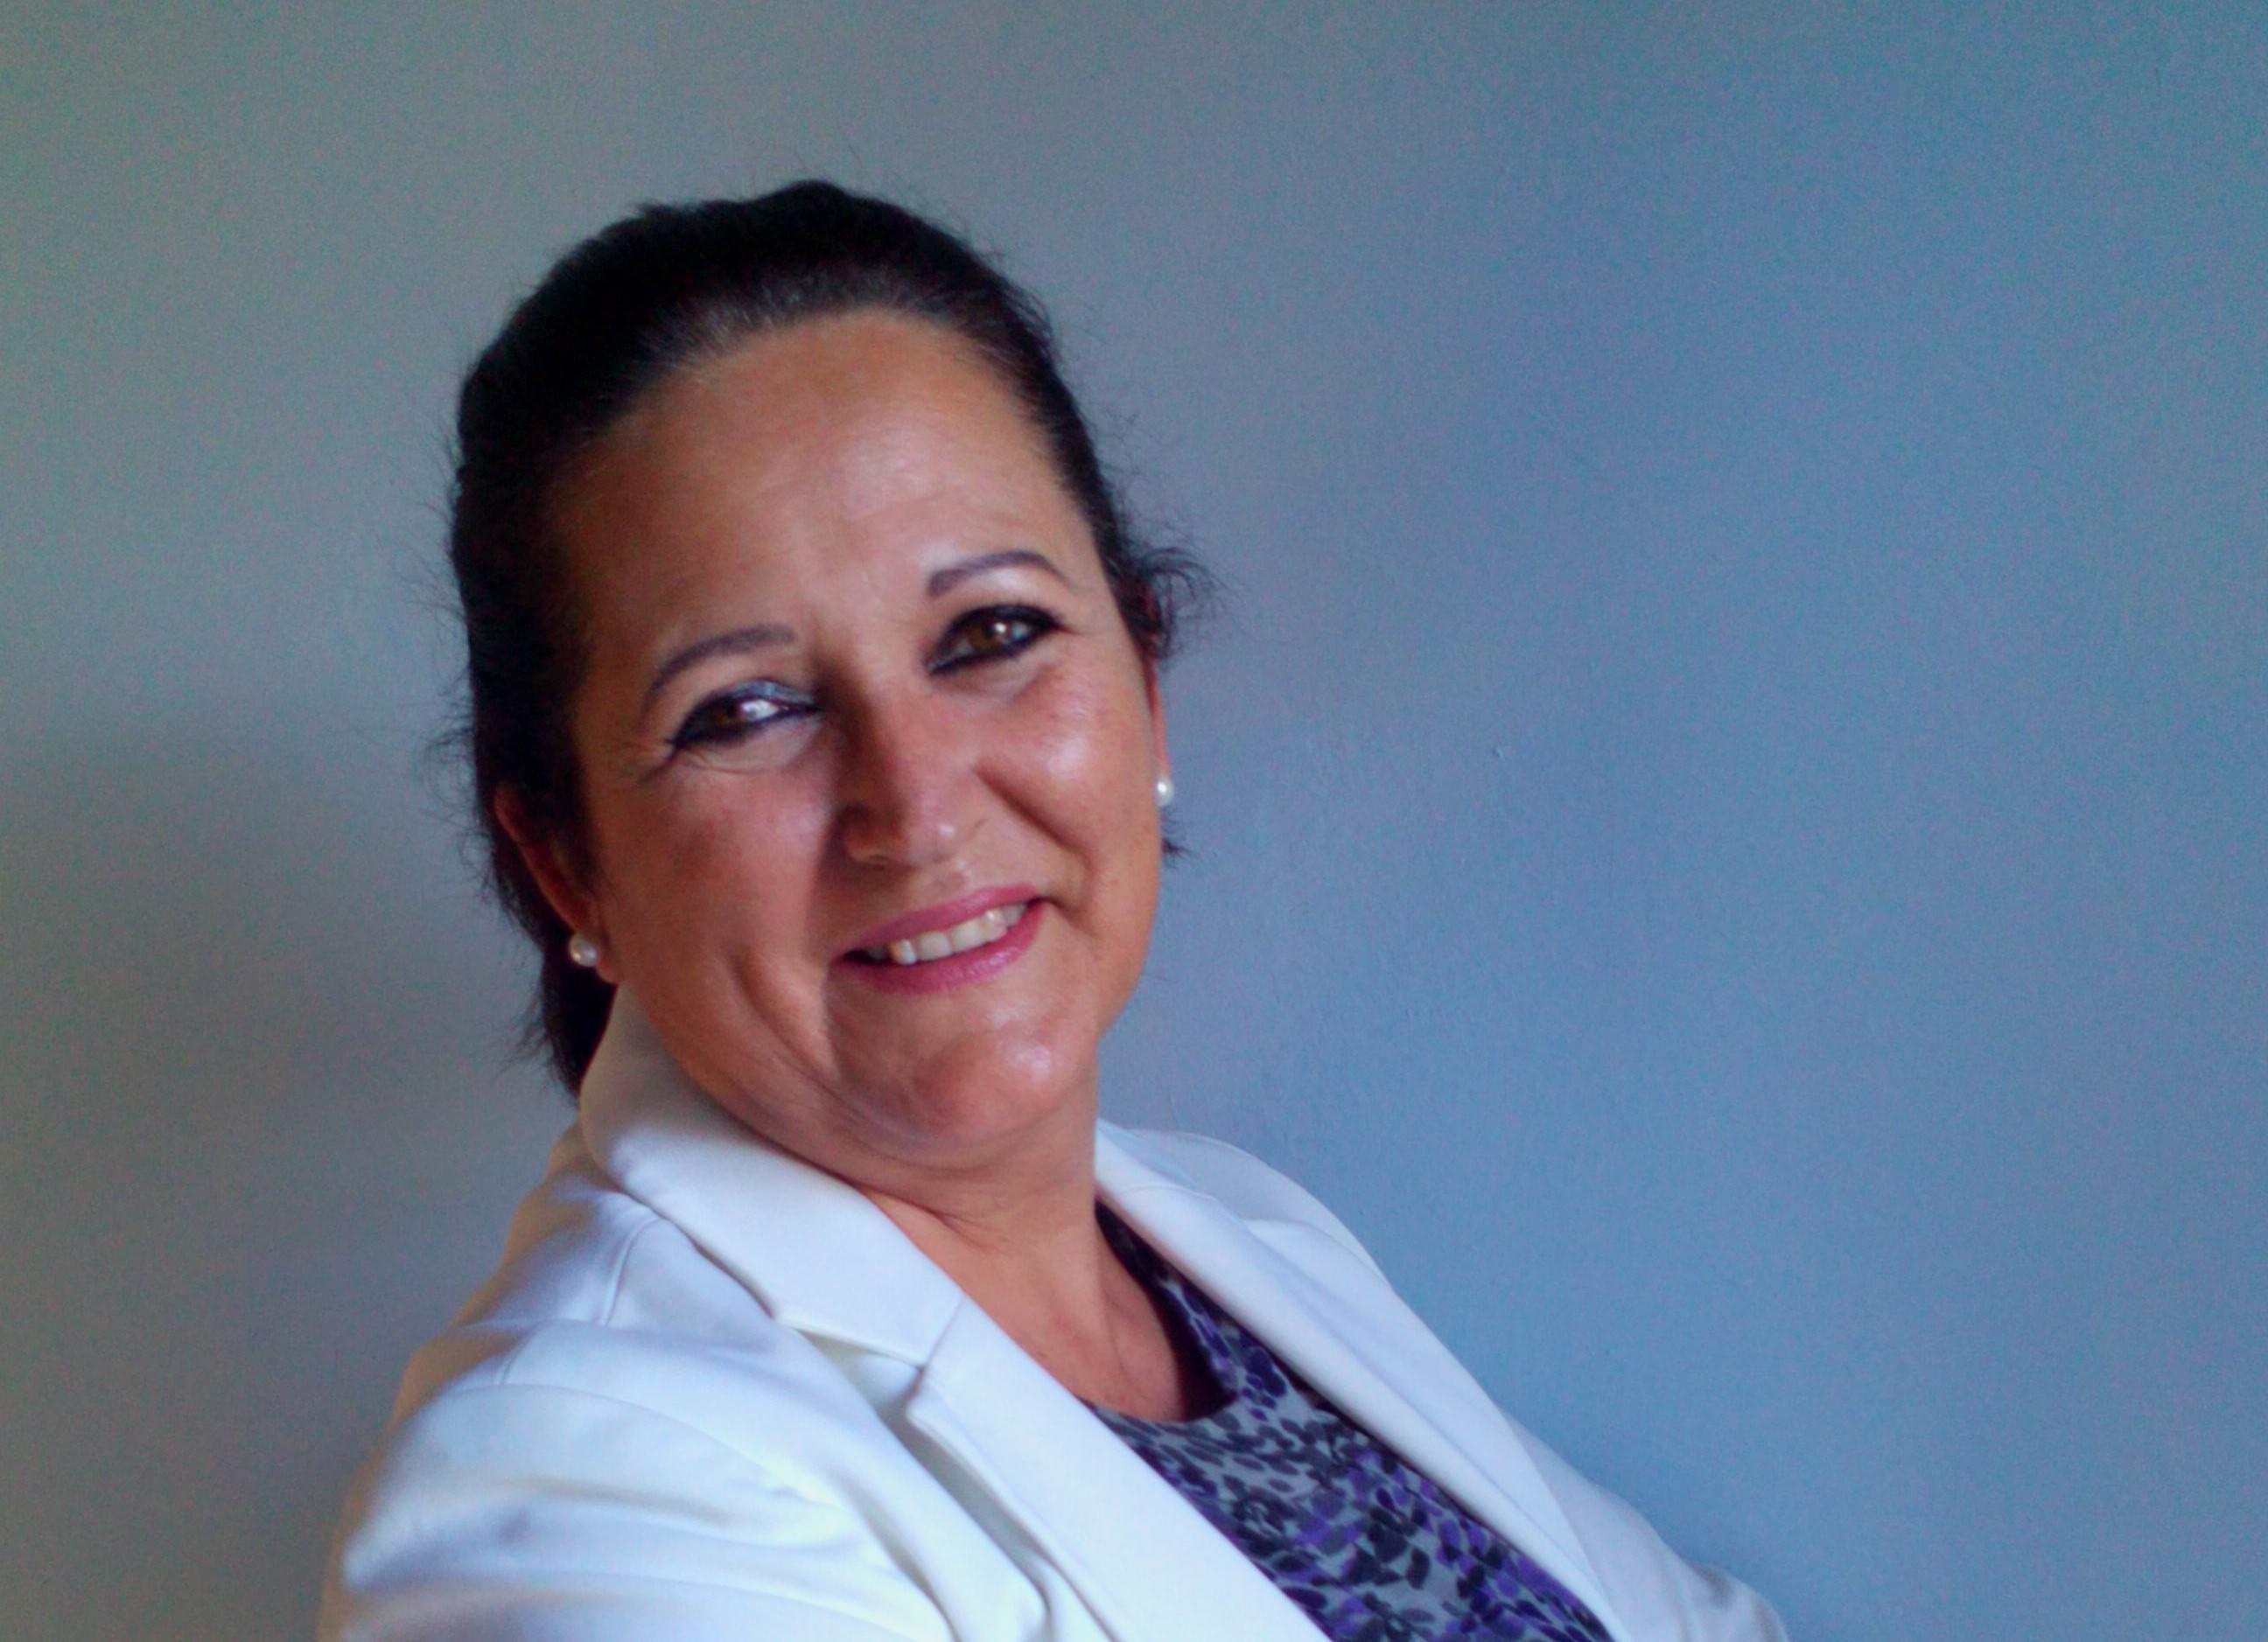 Pilar Castaño